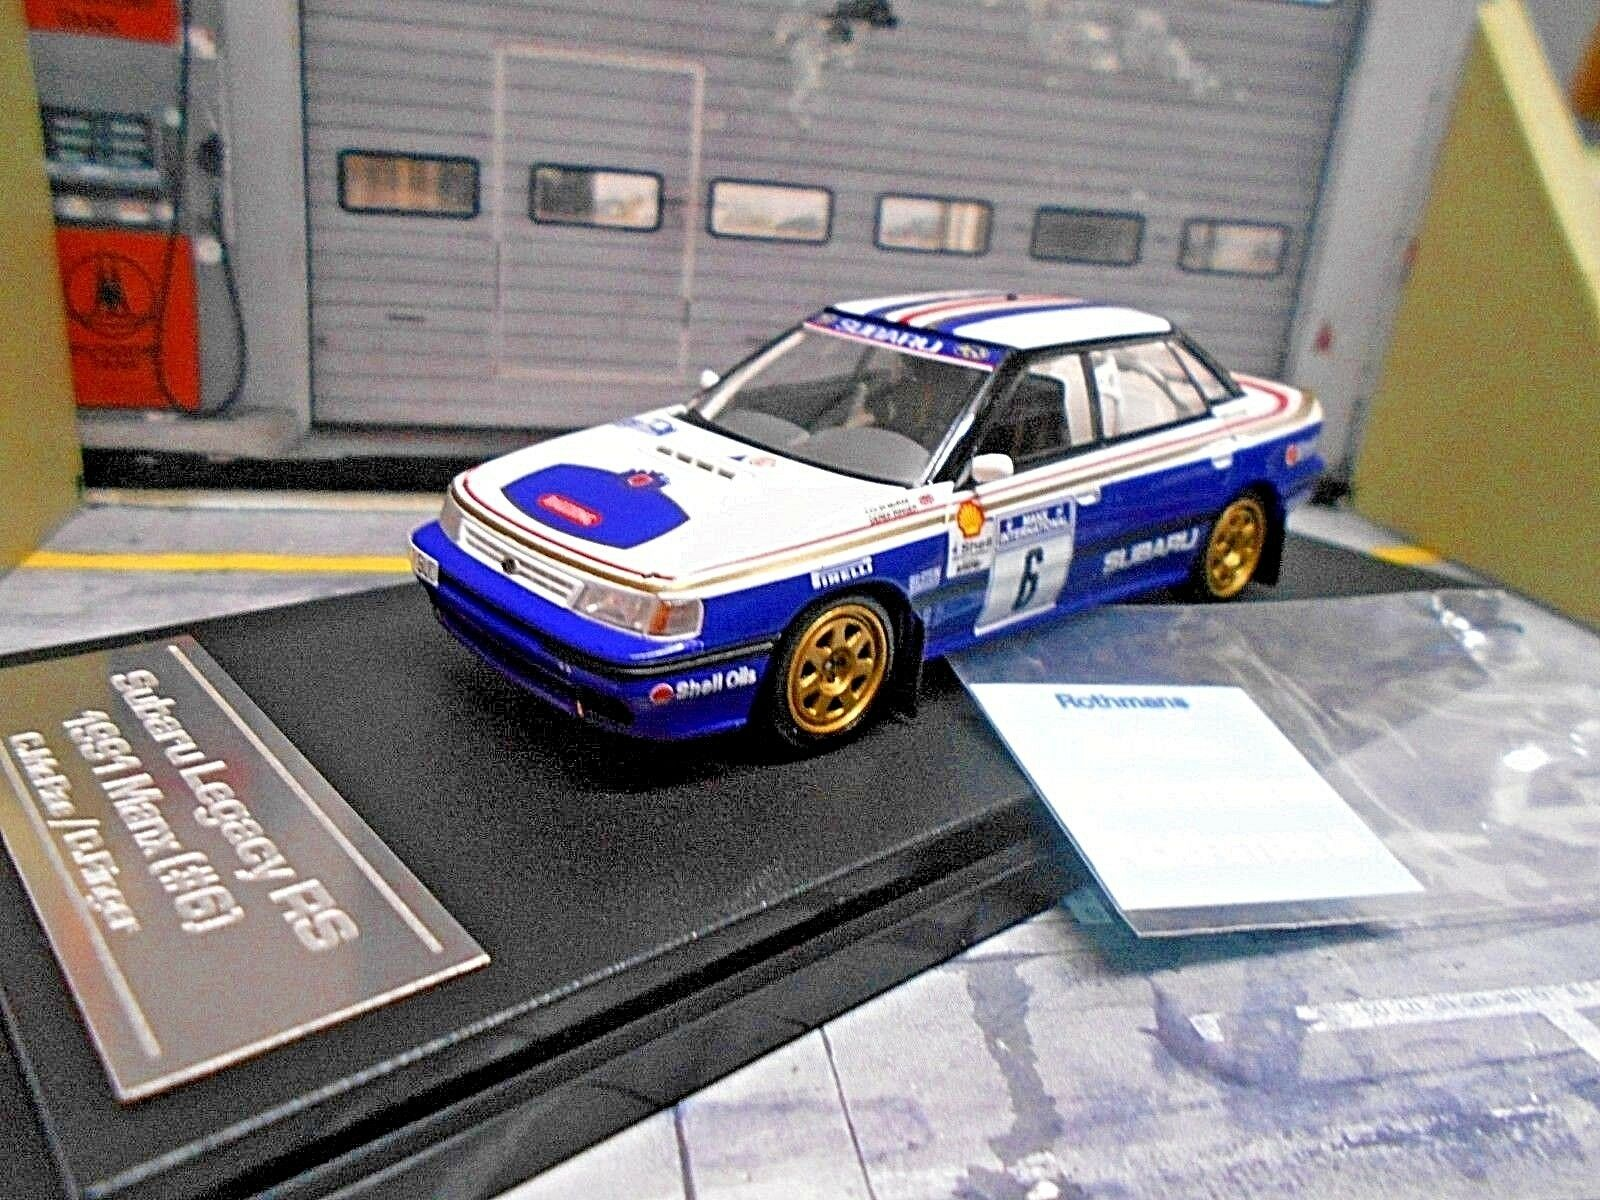 Subaru Legacy impreza RS rally Manx 1991 mcrae rossohman S + Decals hpi 1 43